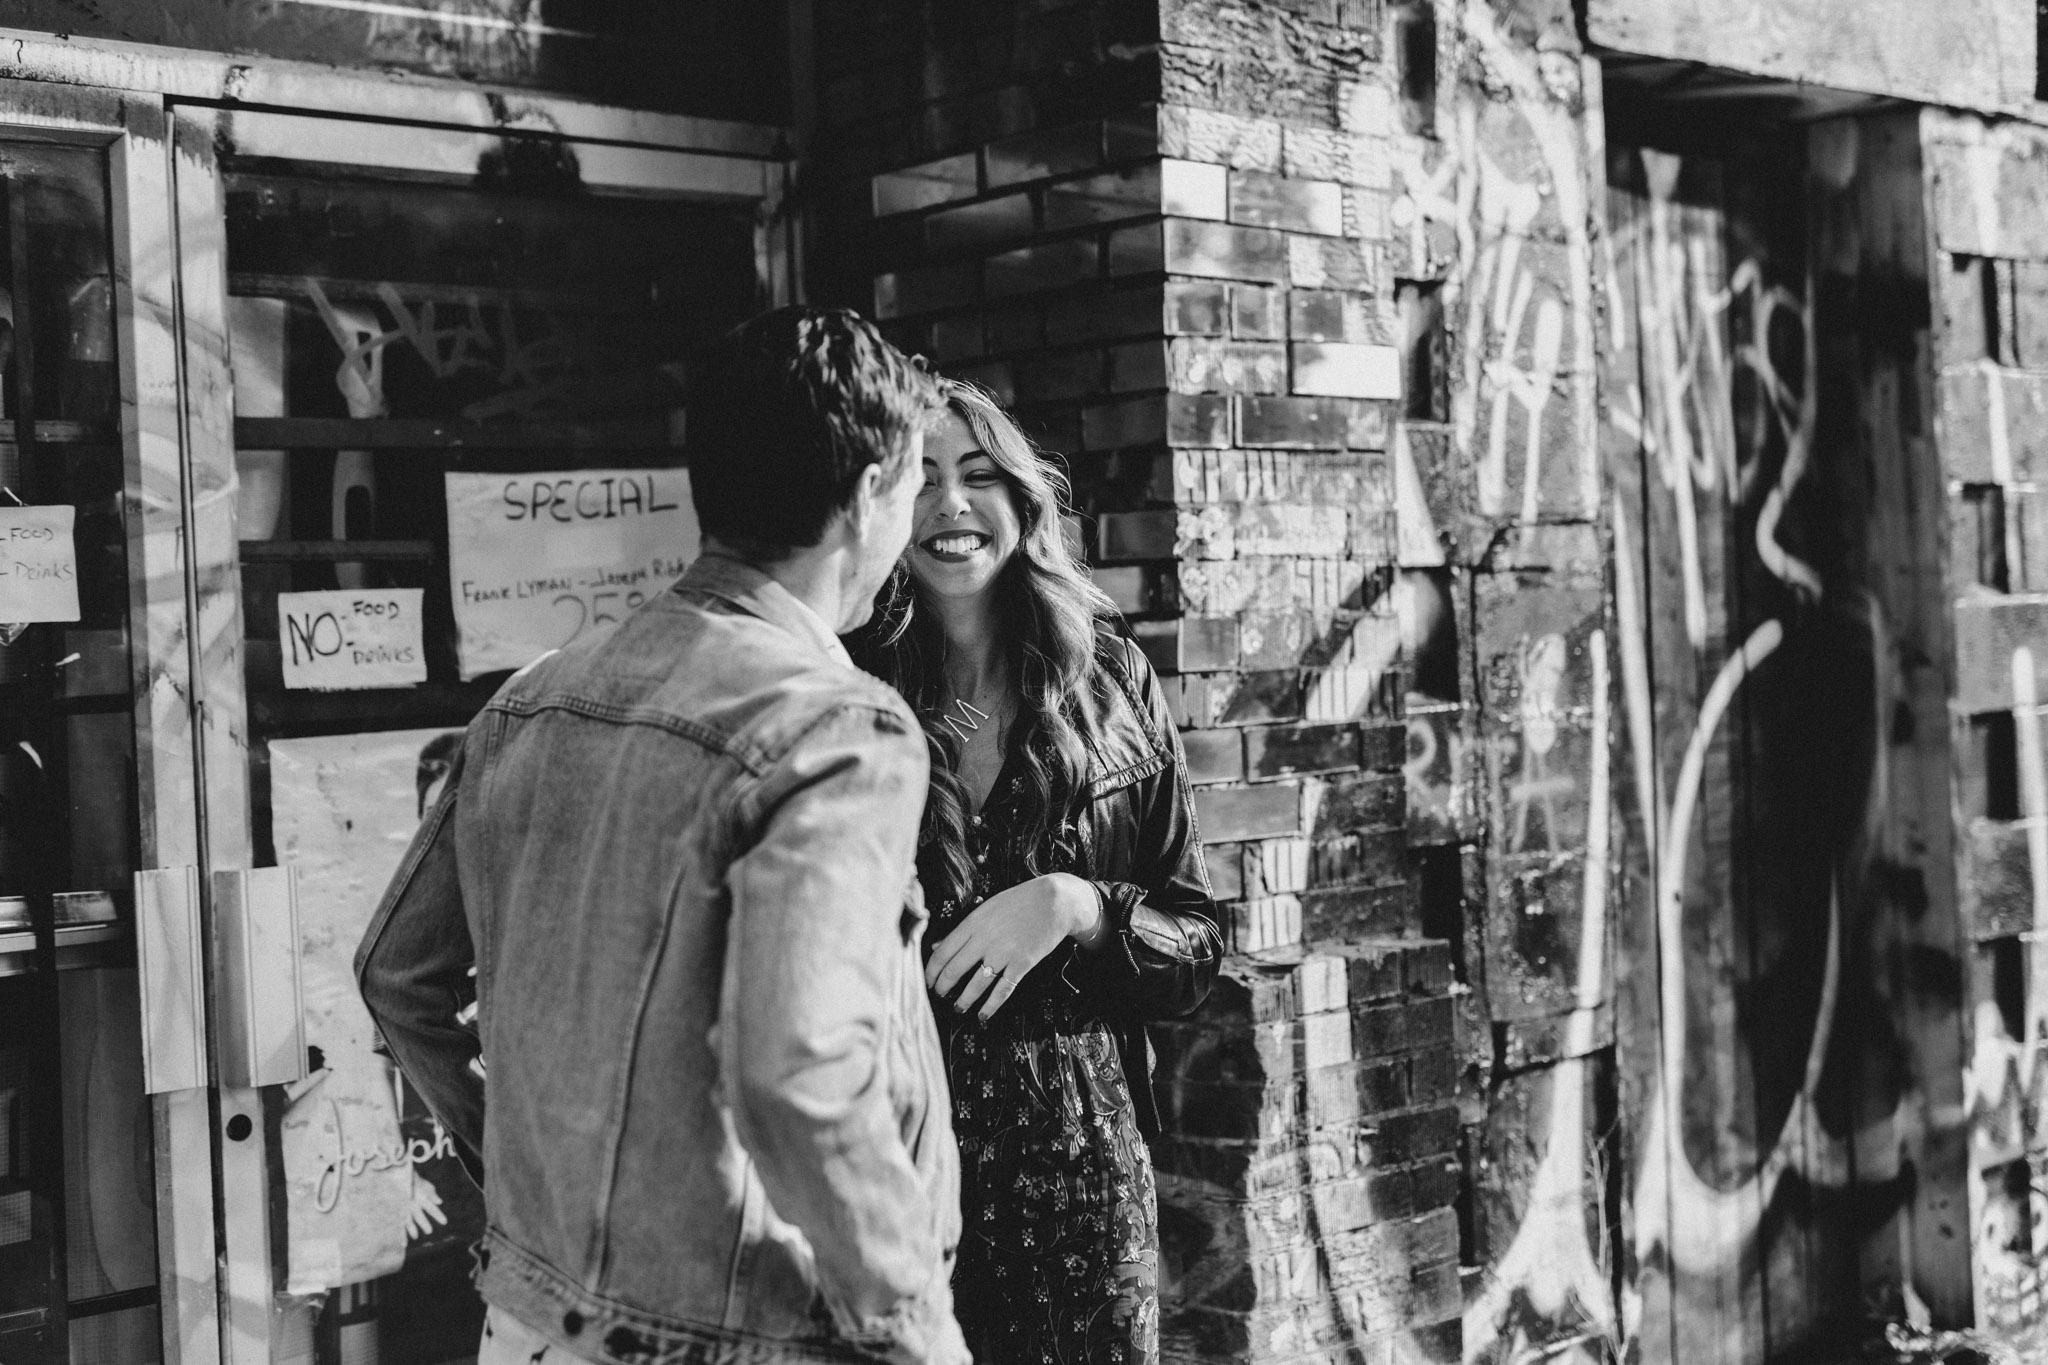 Graffiti alley. Kensington Engagement. Jennifer See Studios.